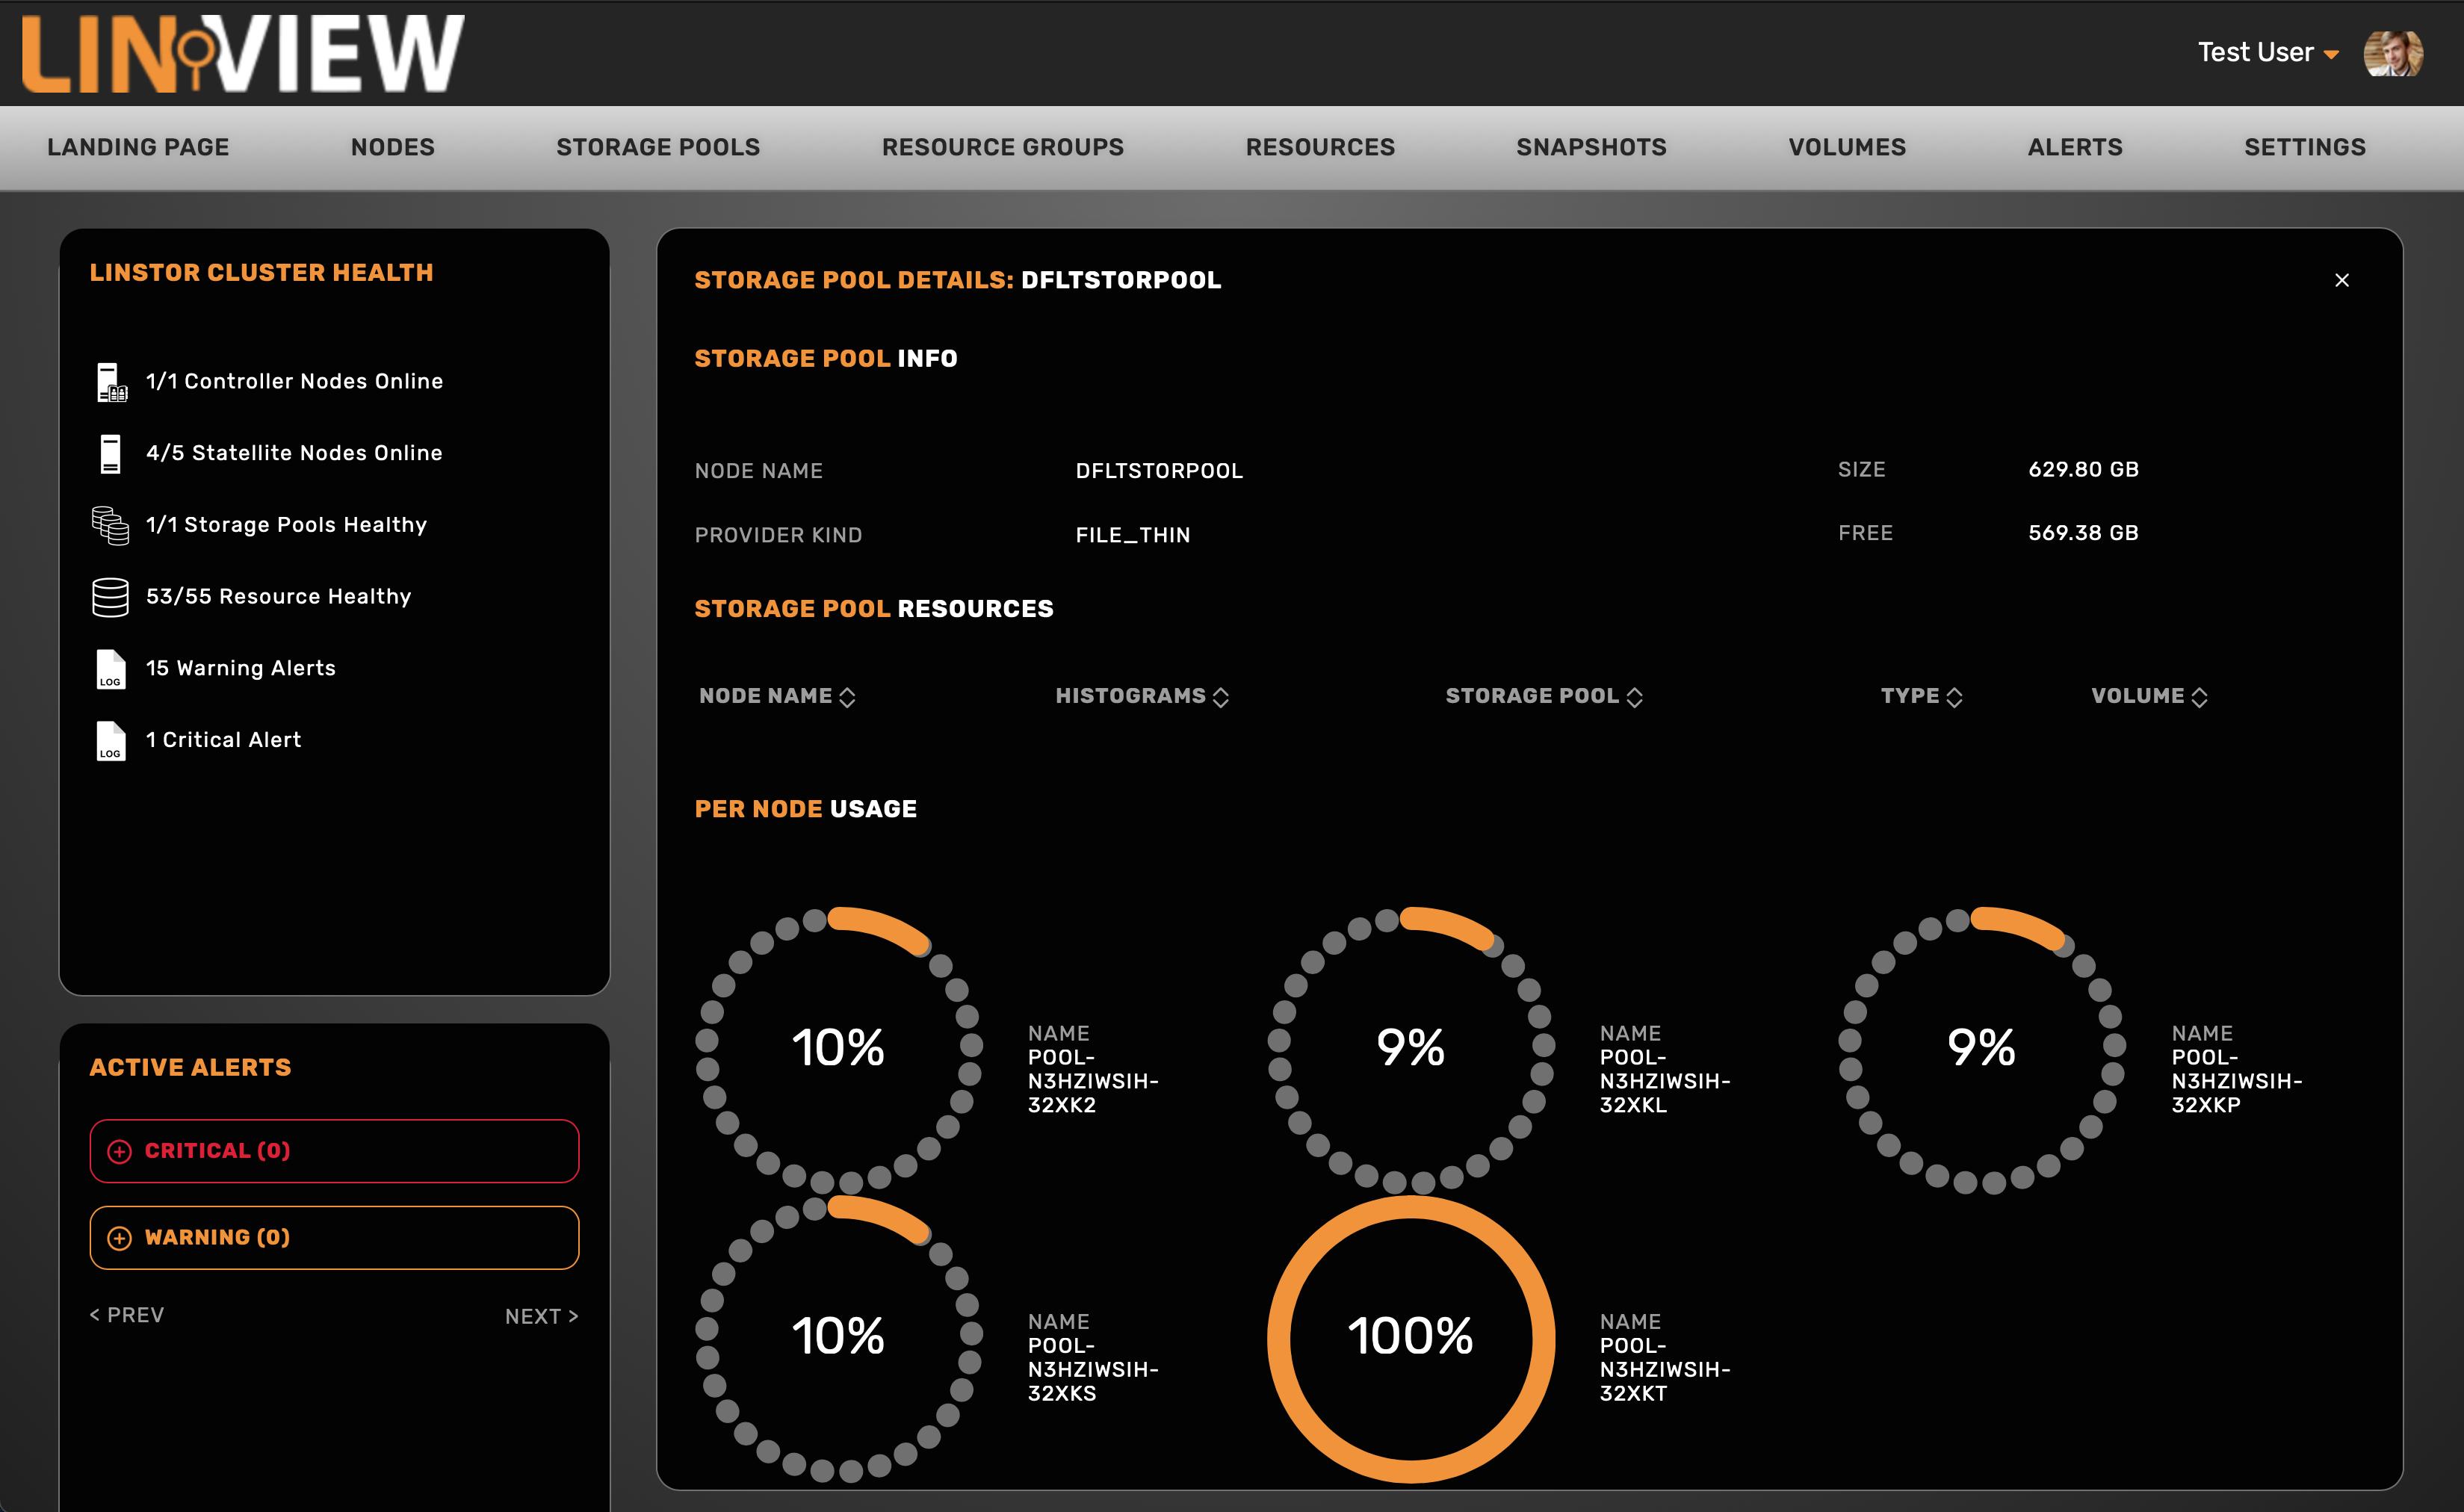 Storage pool dashboard with per node usage